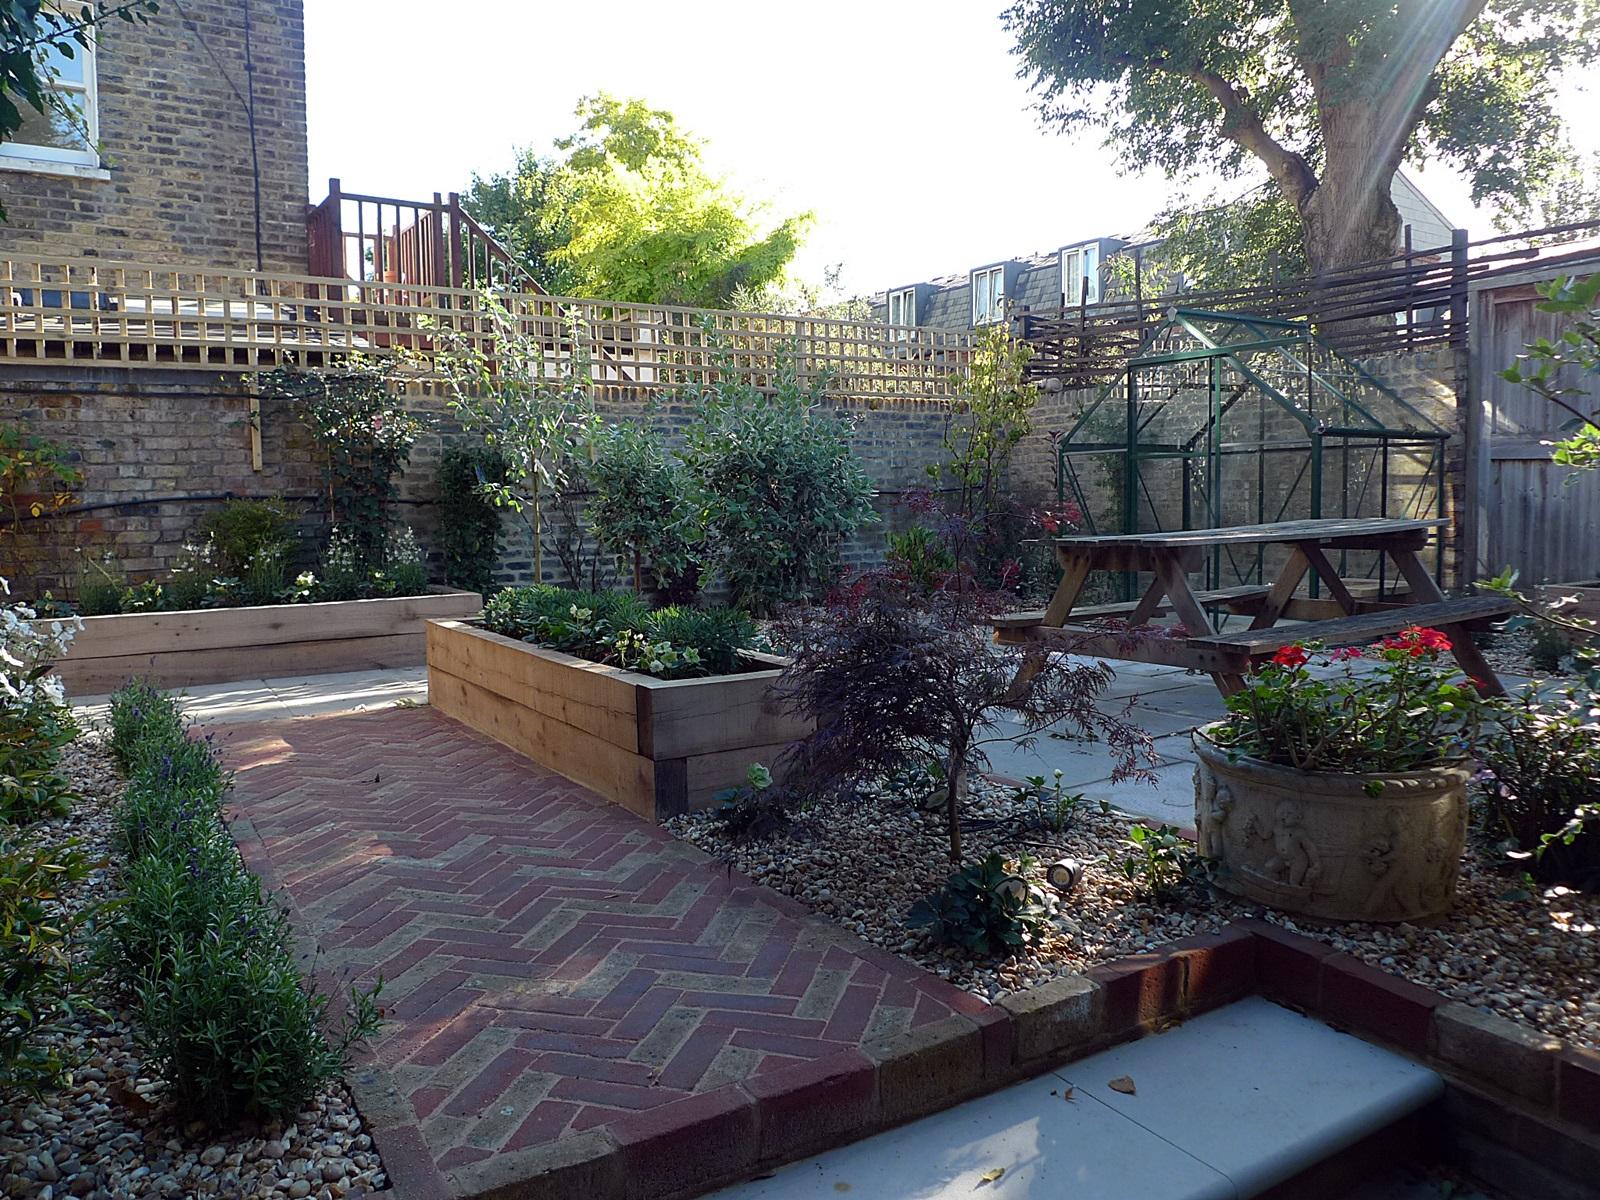 victorian style garden design london herring bone paving sandstone paving oak railway sleeper railway beds